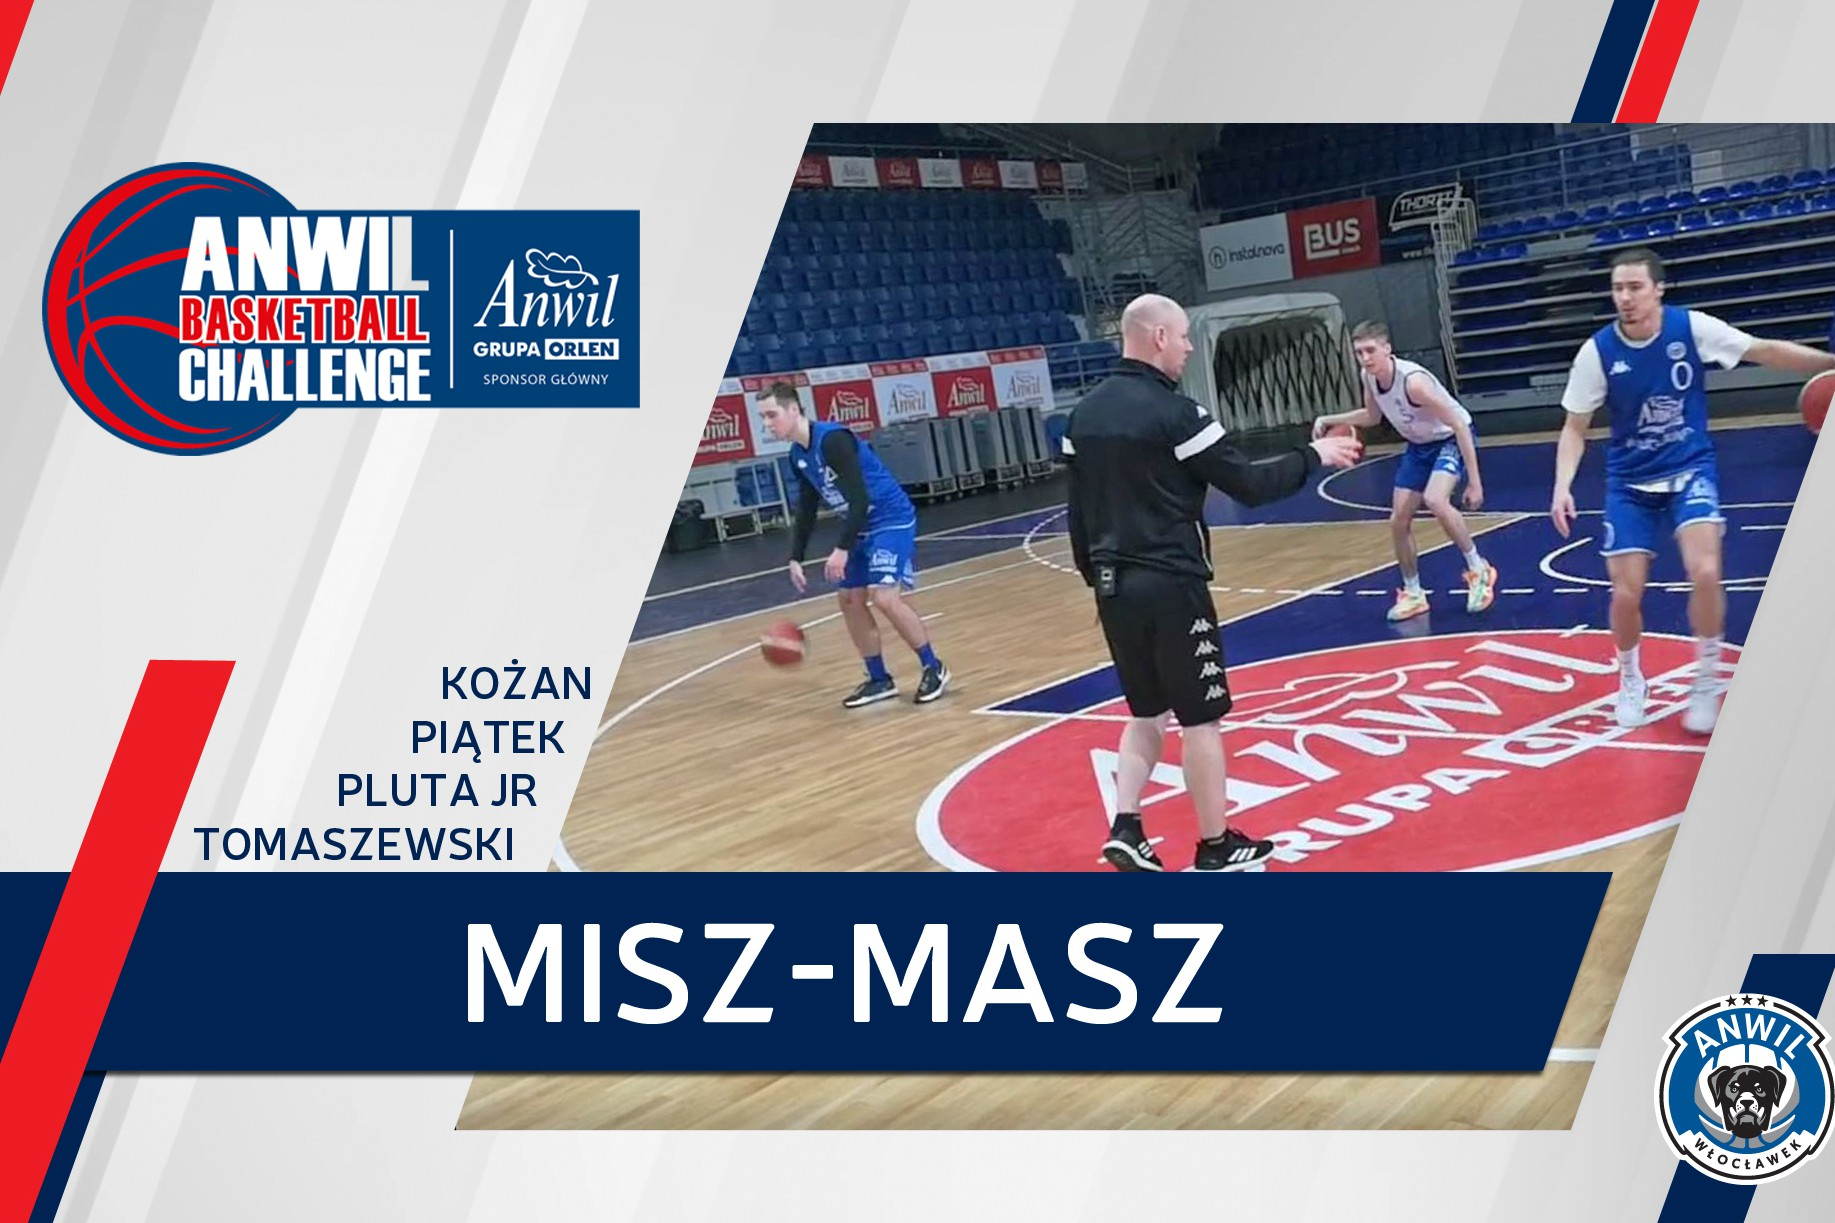 Wideo | Anwil Basketball Challenge #6 - podsumowanie